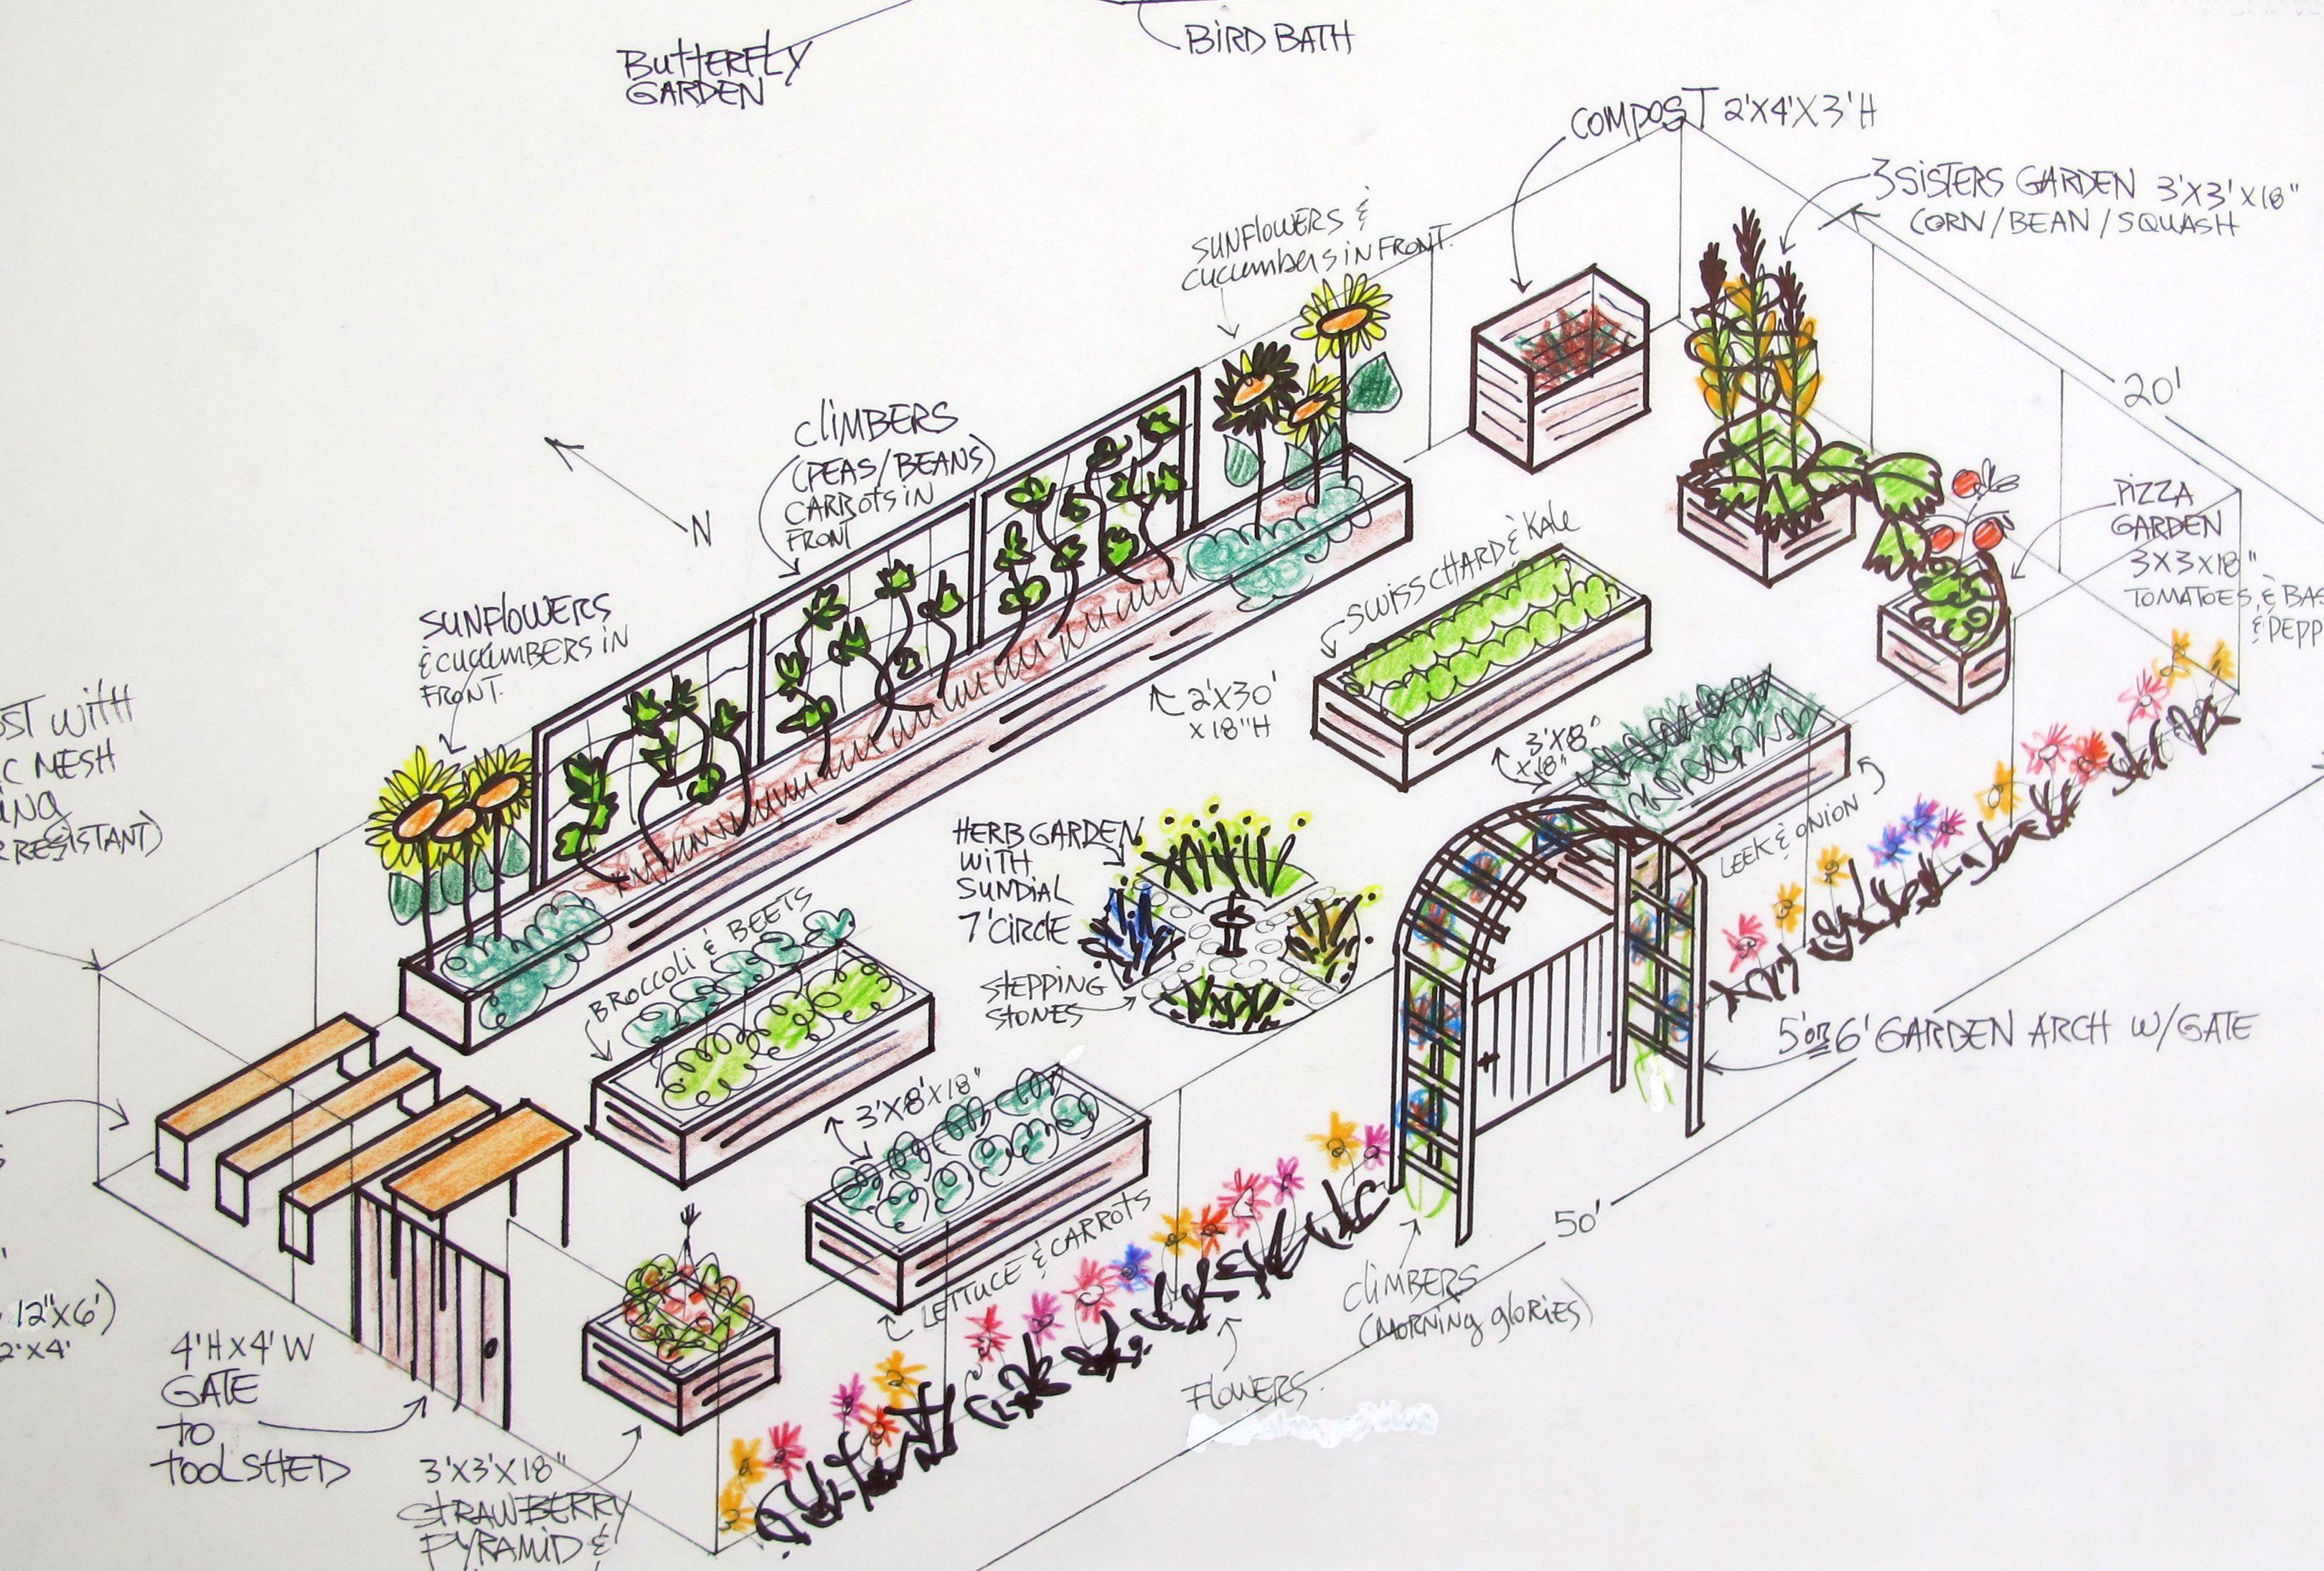 medium resolution of we have a beautiful 50 x 20 raised bed garden design drawn up by marjolaine arsenault garden spirit landscaping description from northwarren k12 ny us